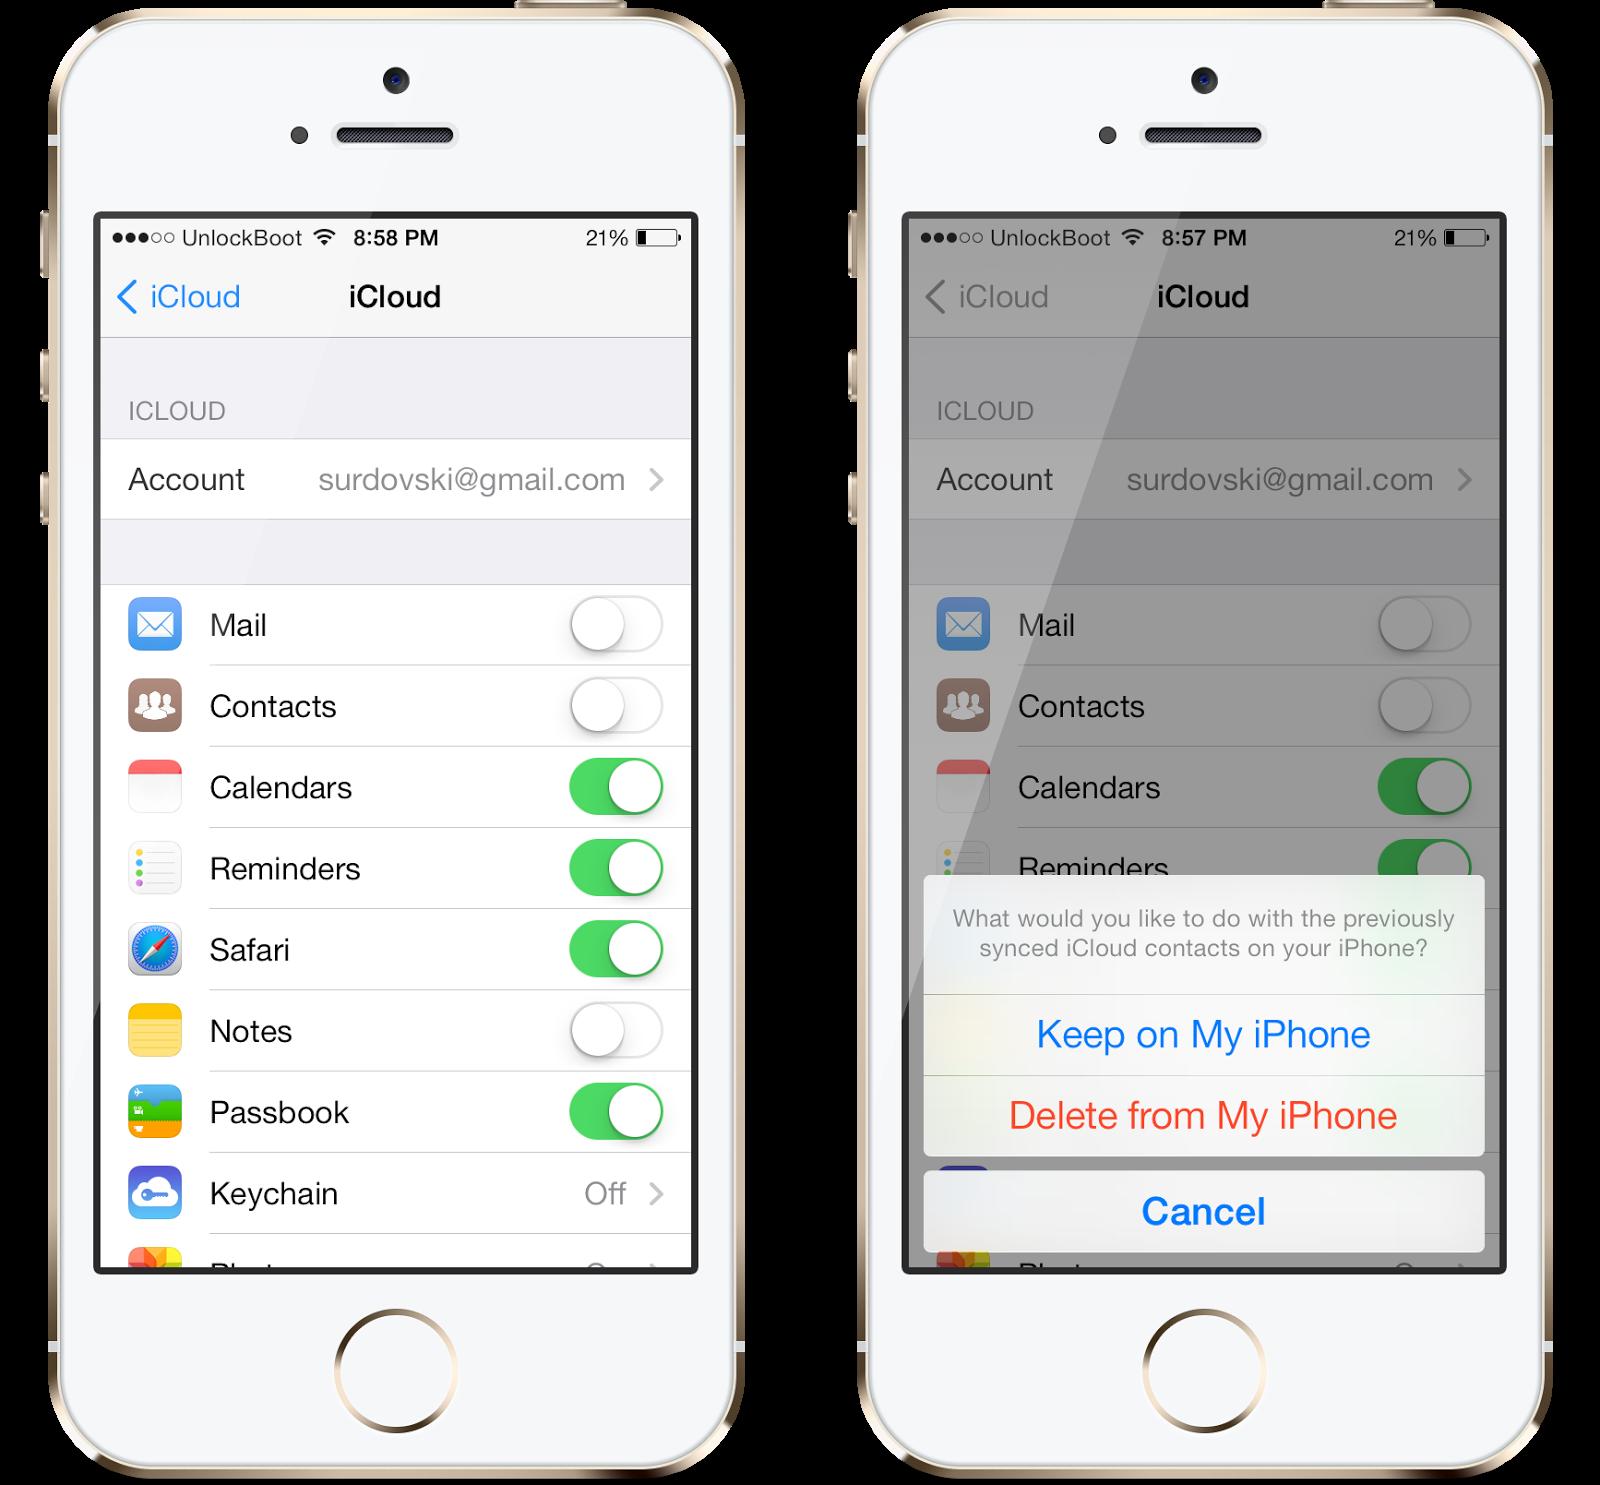 Импорт контактов с SIM-карты на iPhone - Служба поддержки 19